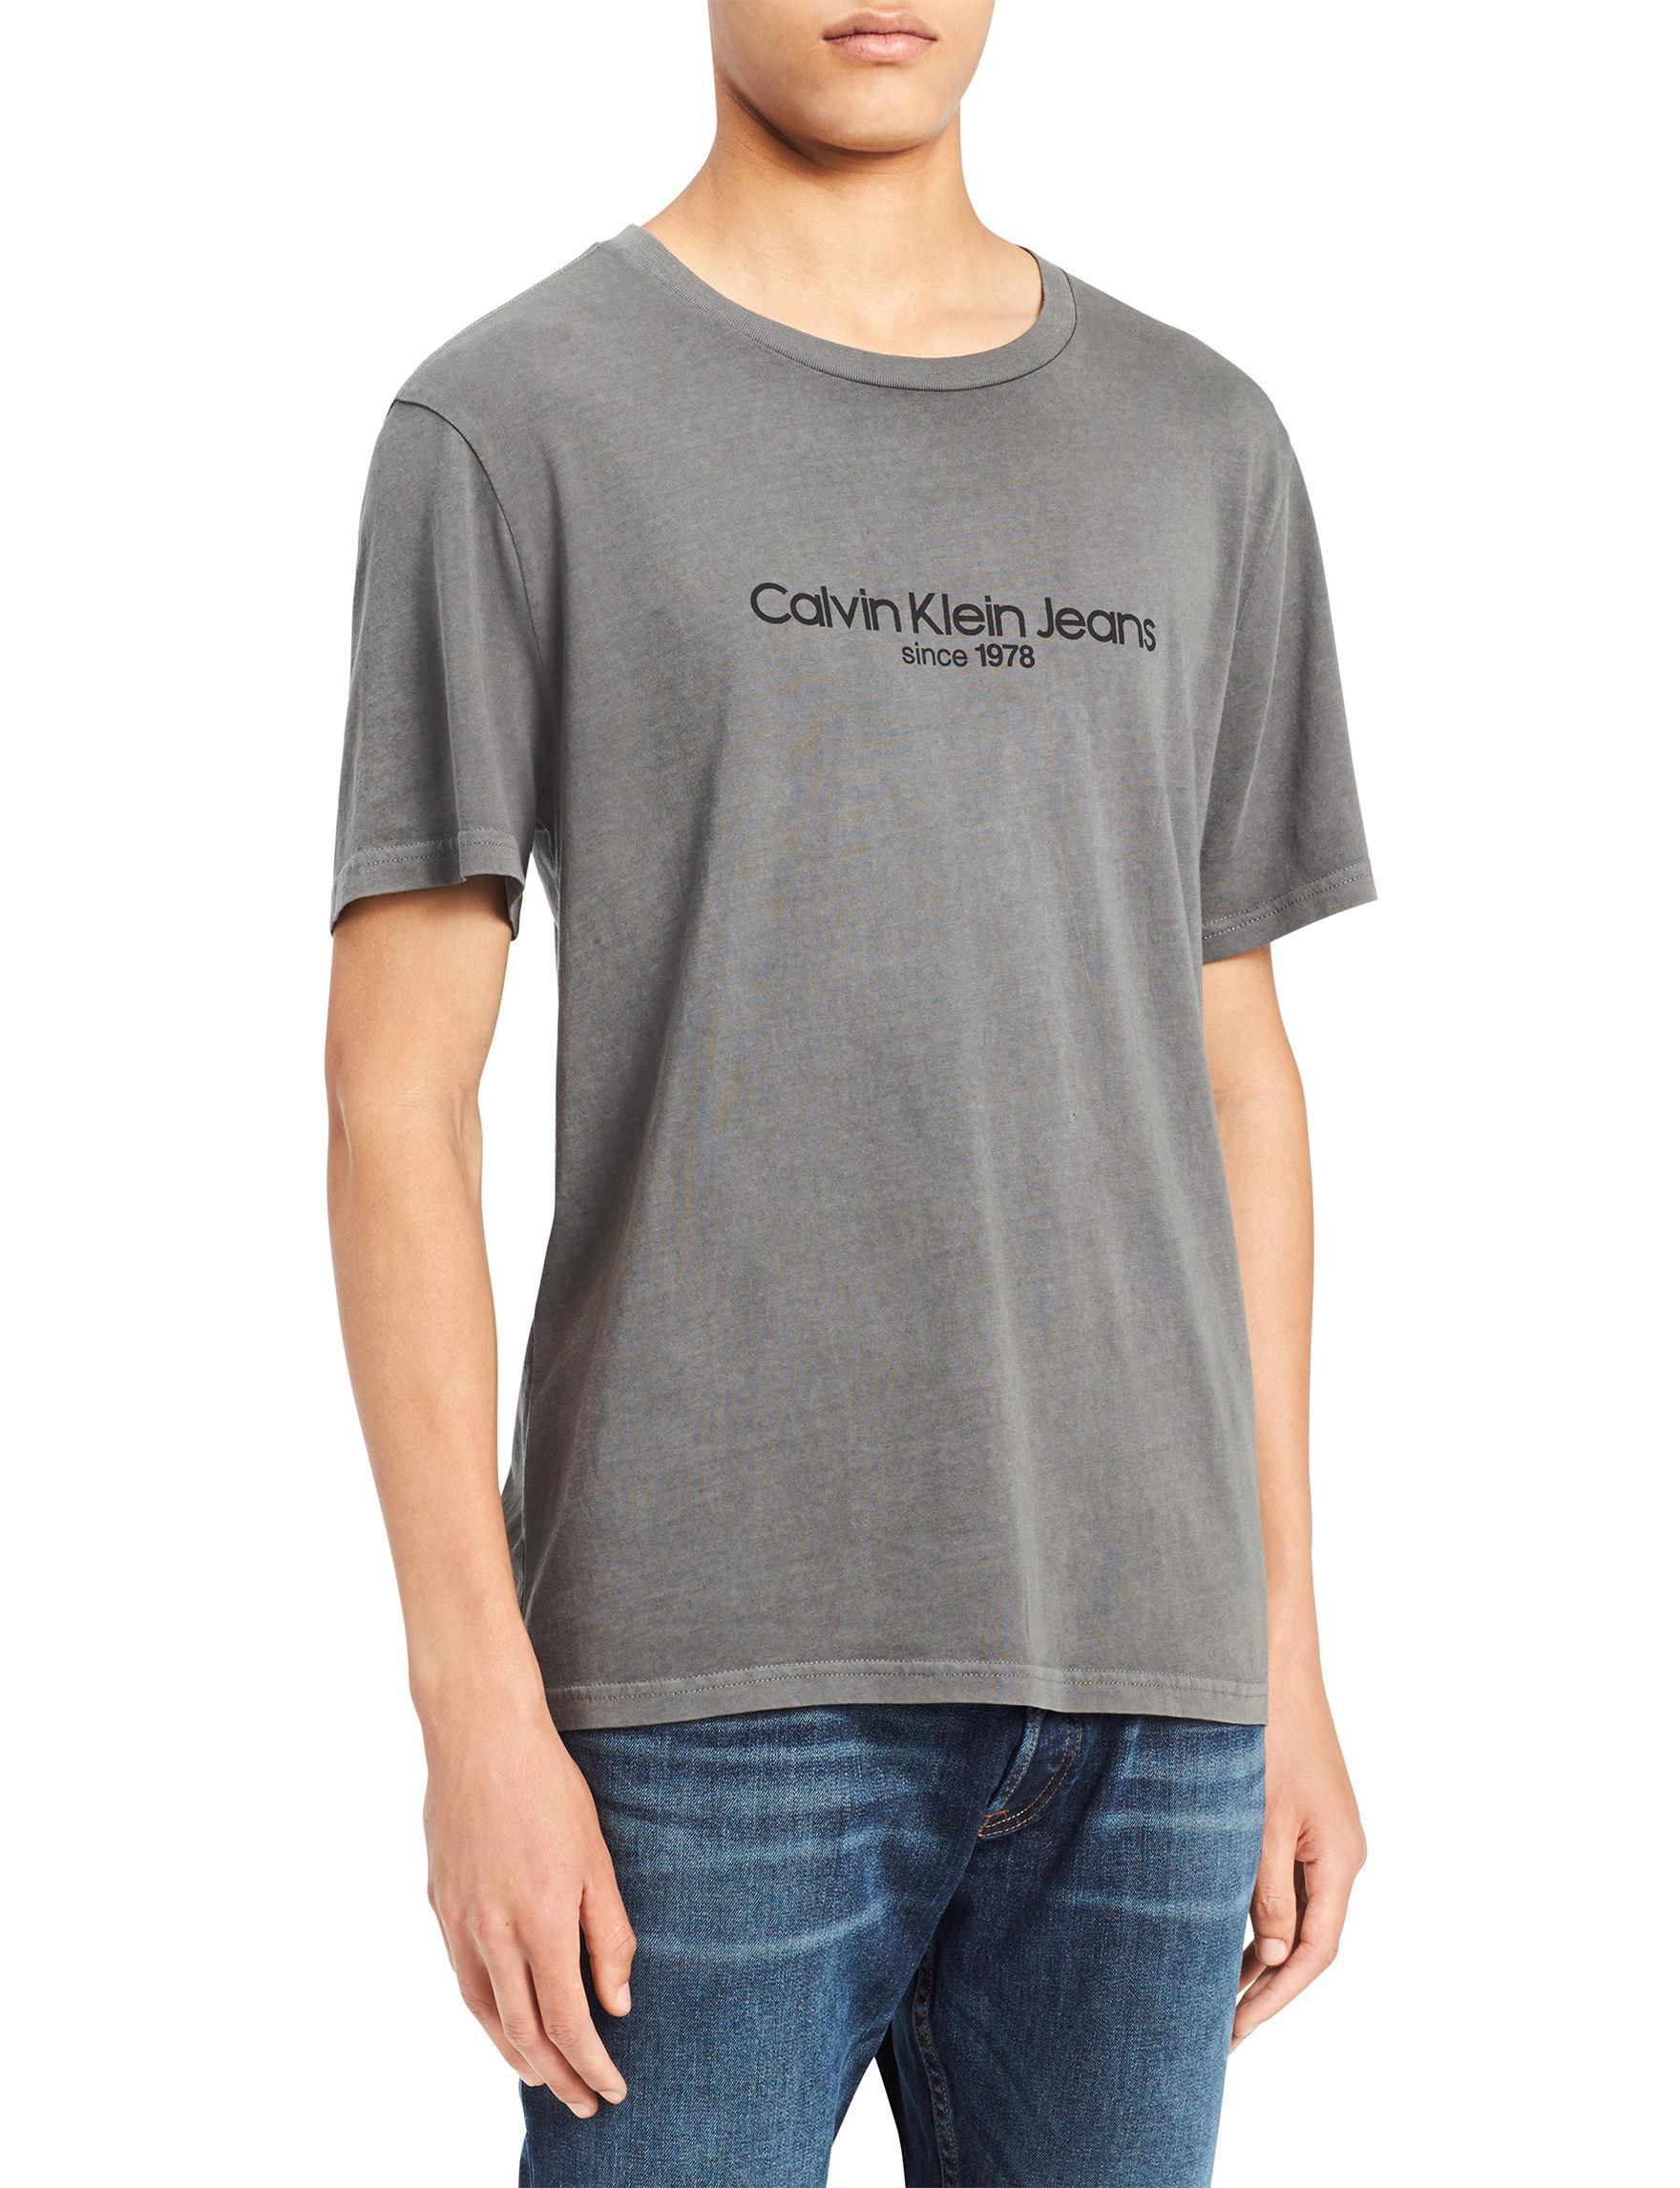 Calvin Klein Dark Grey Tees & Tanks